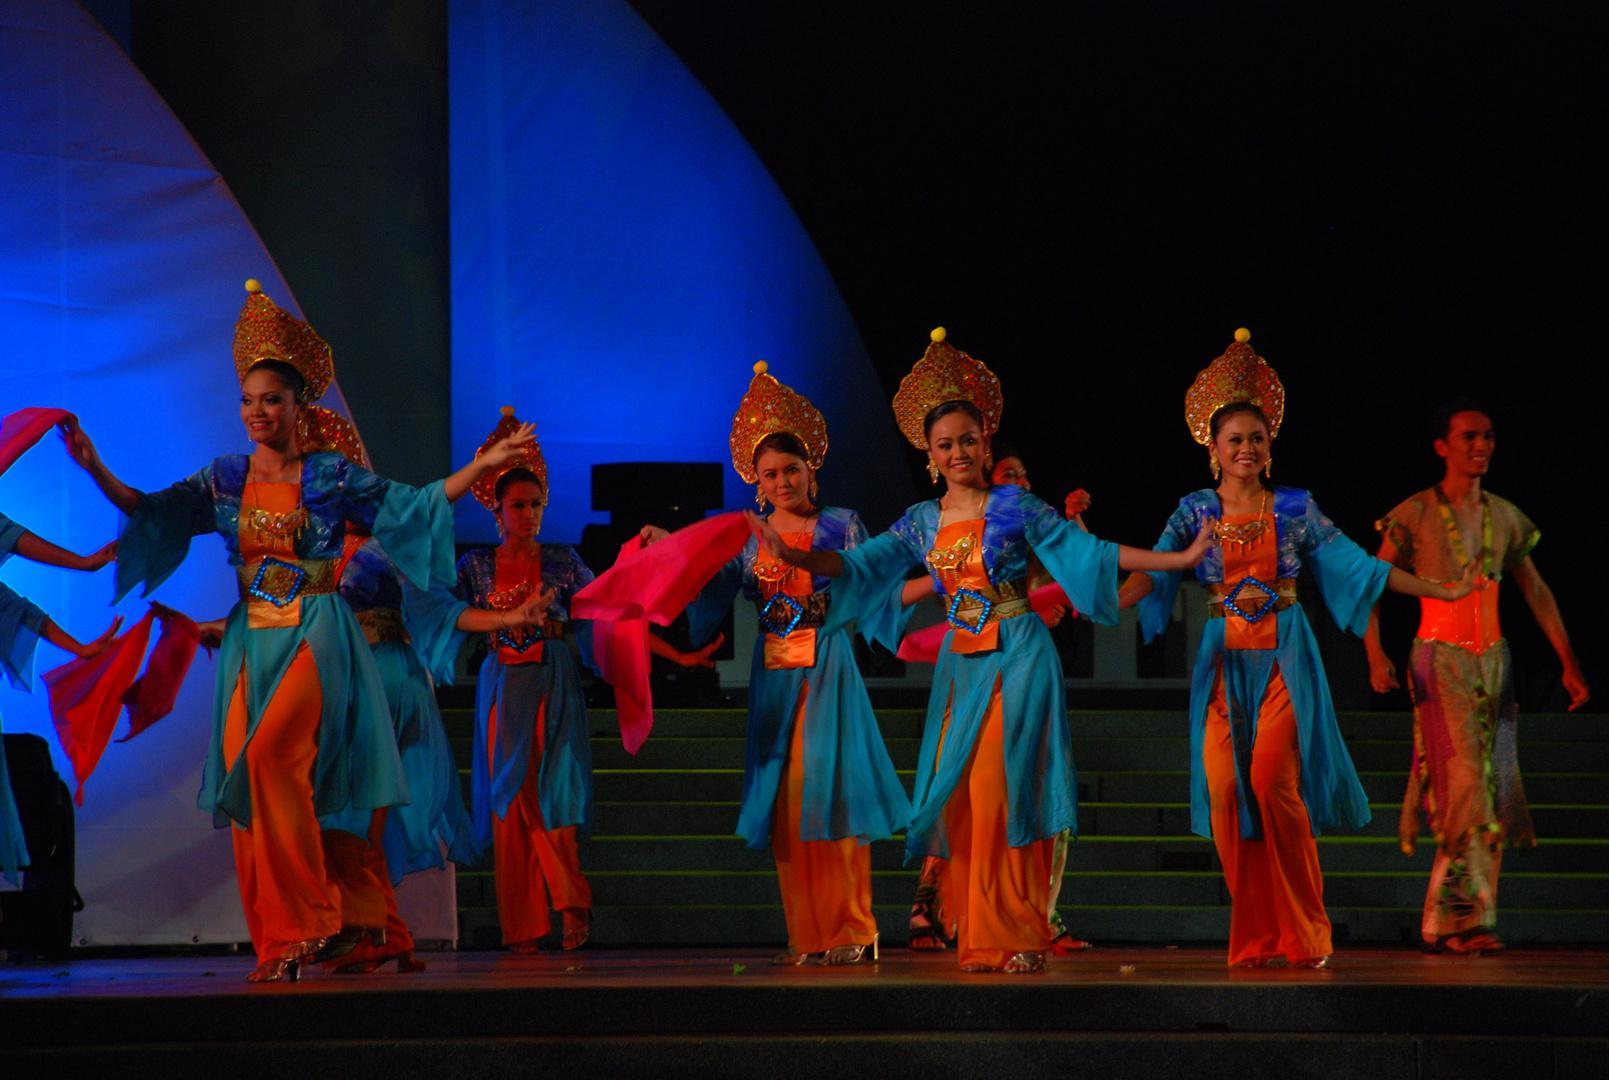 Freilichtbühne Kuala Lumpur